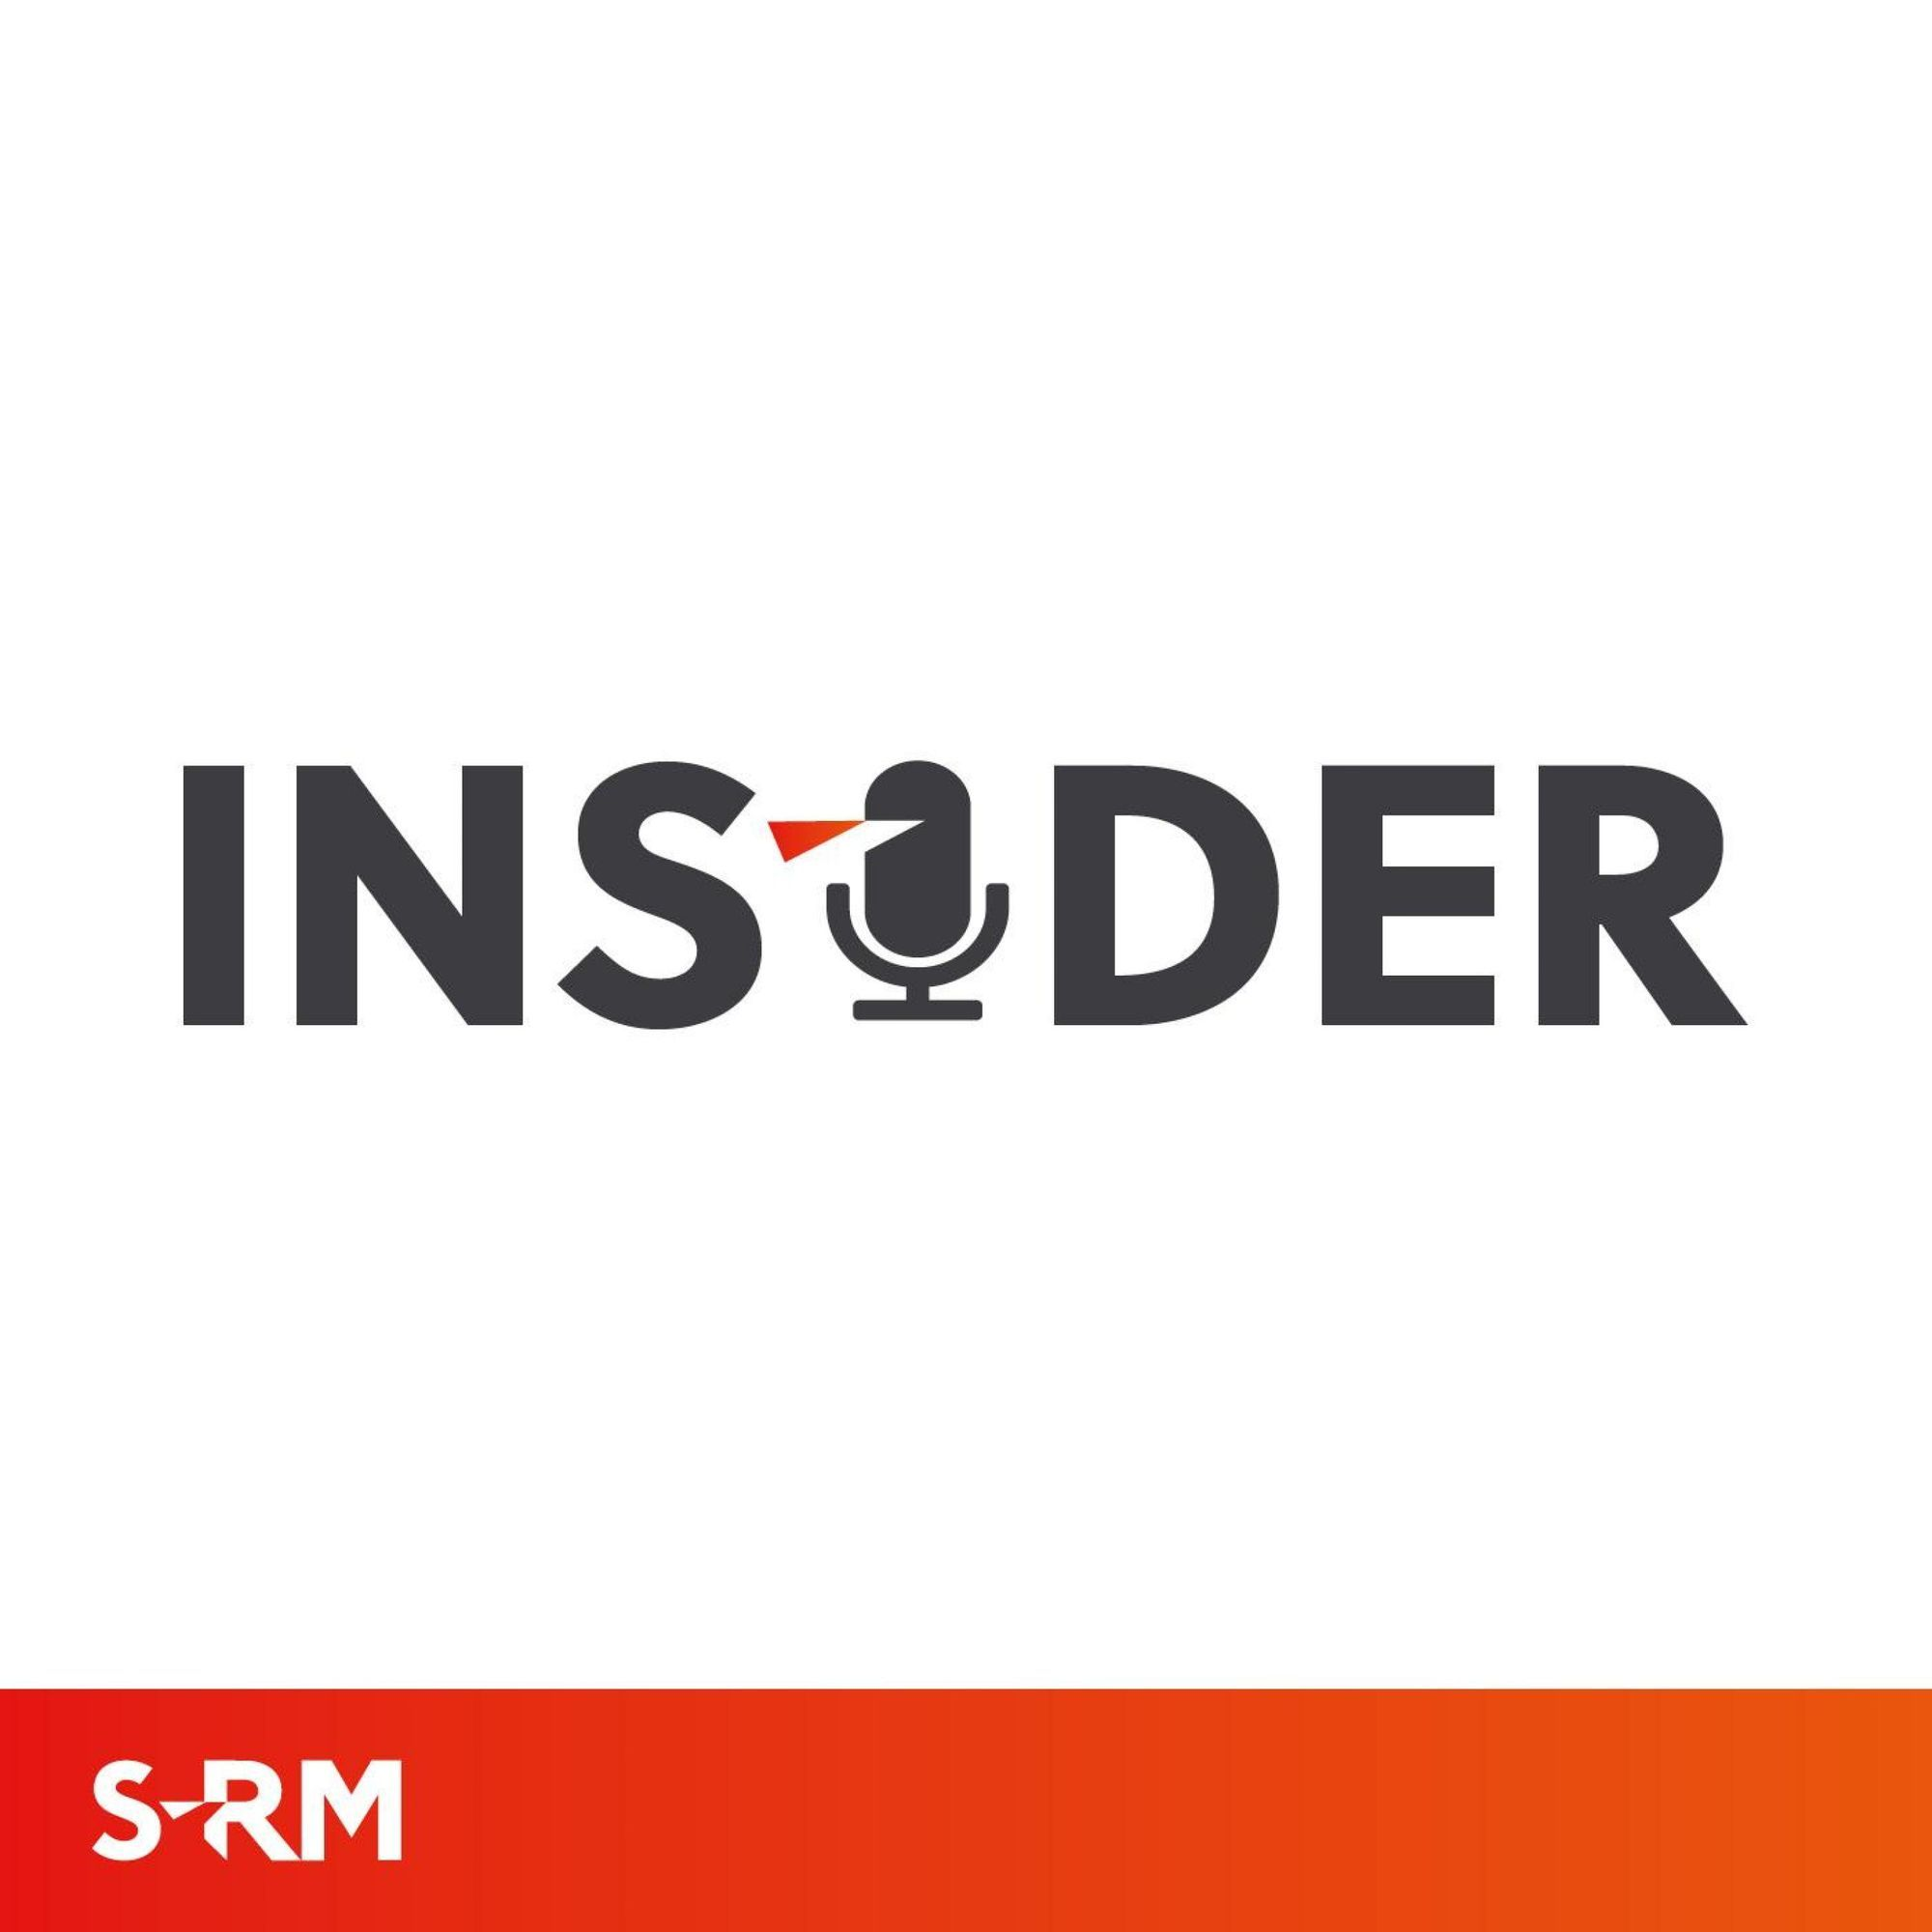 S-RM Insider Podcast Logo